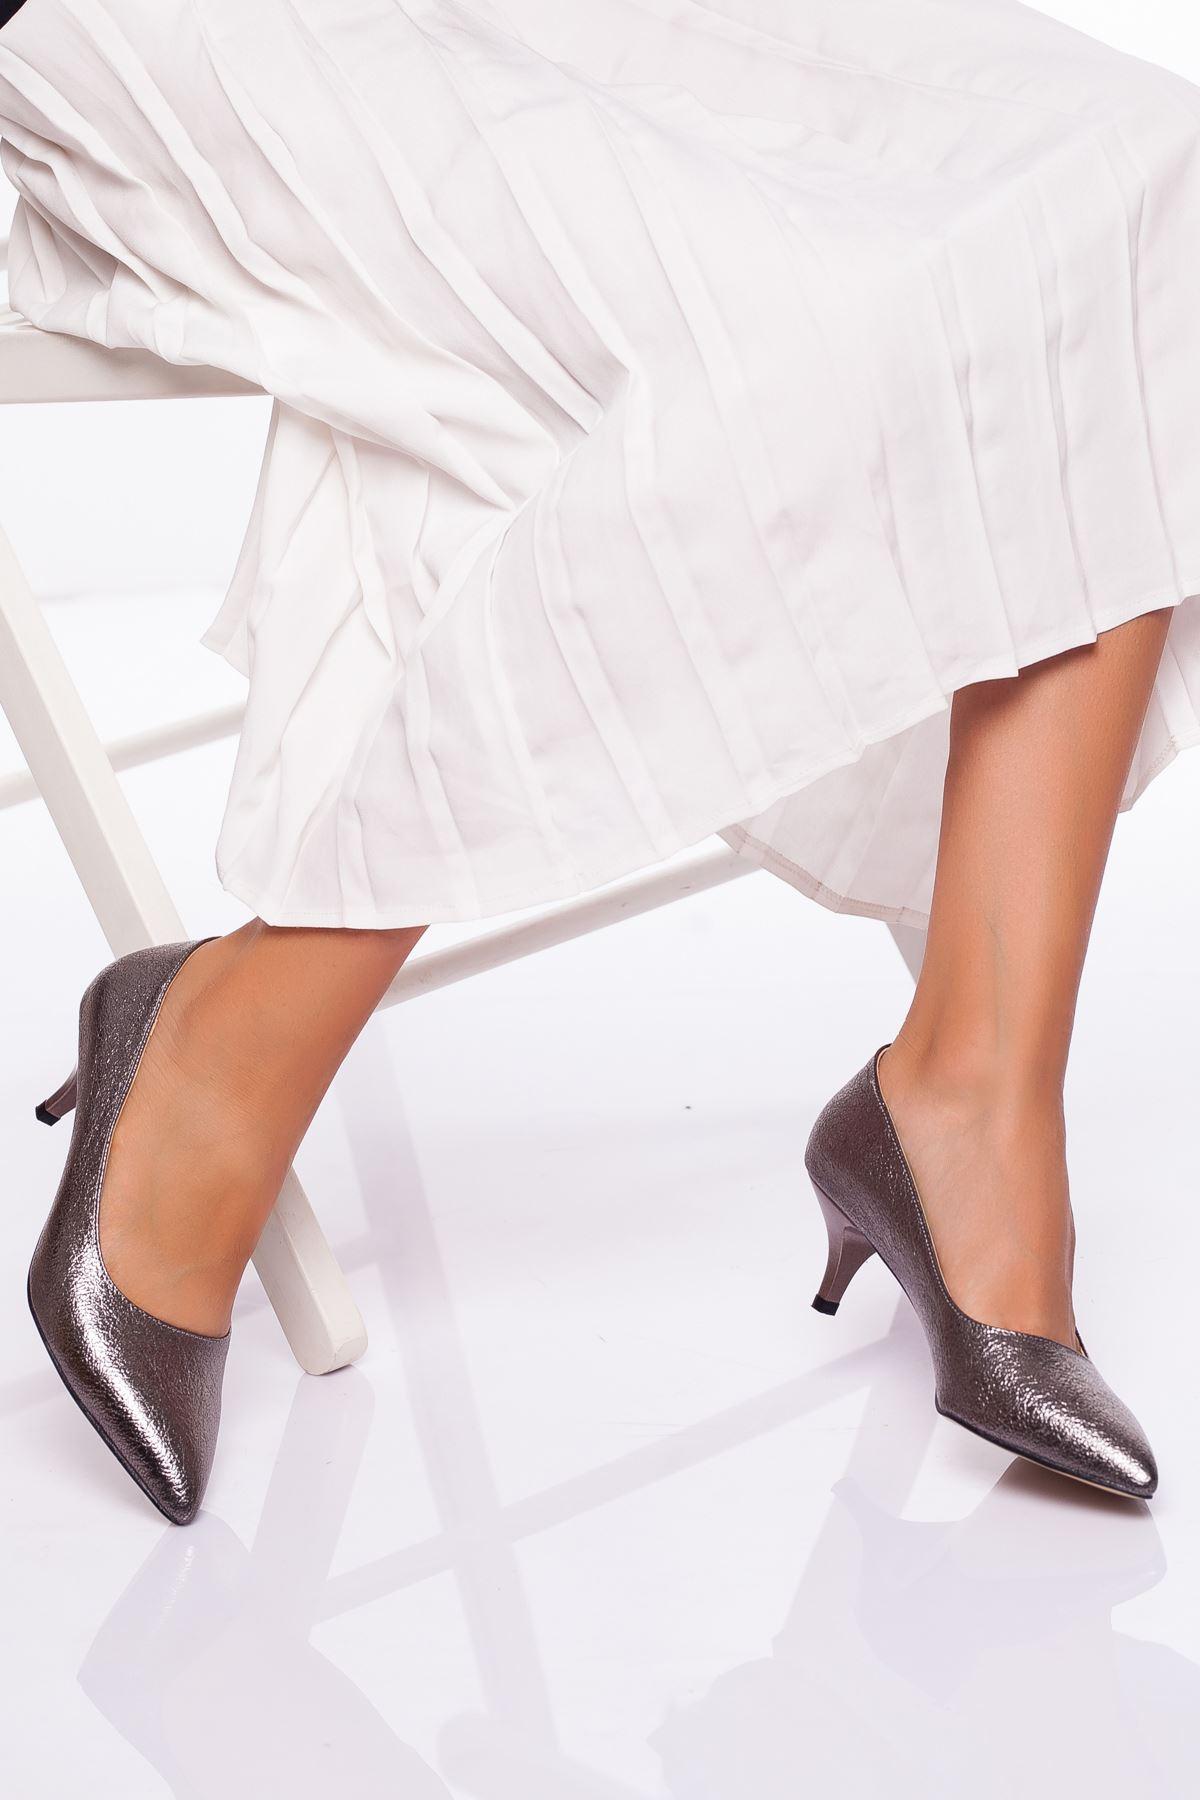 Abella Topuklu Ayakkabı PLATİN